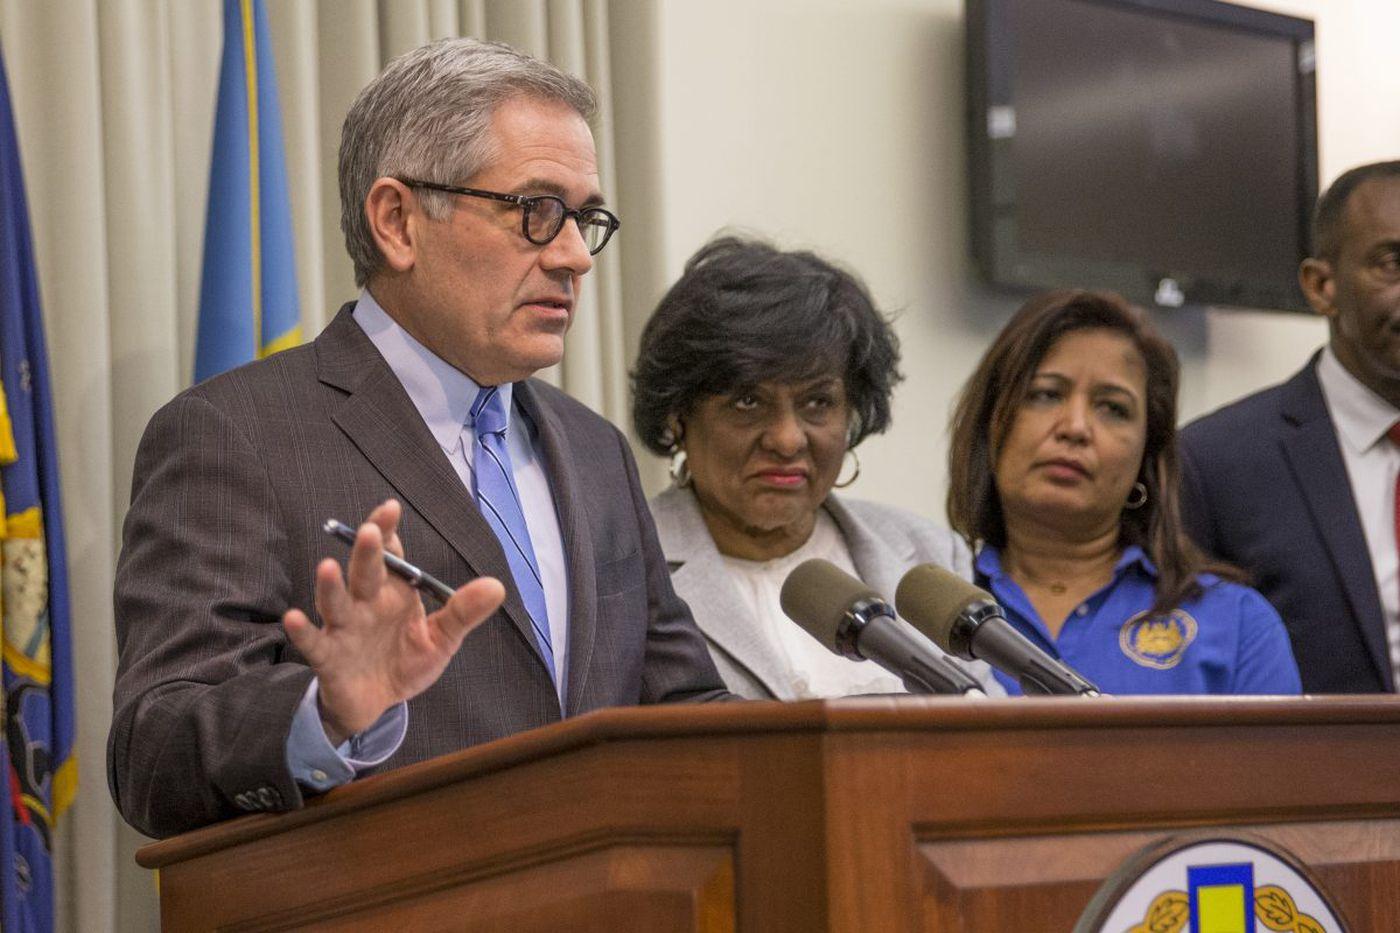 Philly DA Larry Krasner won't seek cash bail in certain crimes